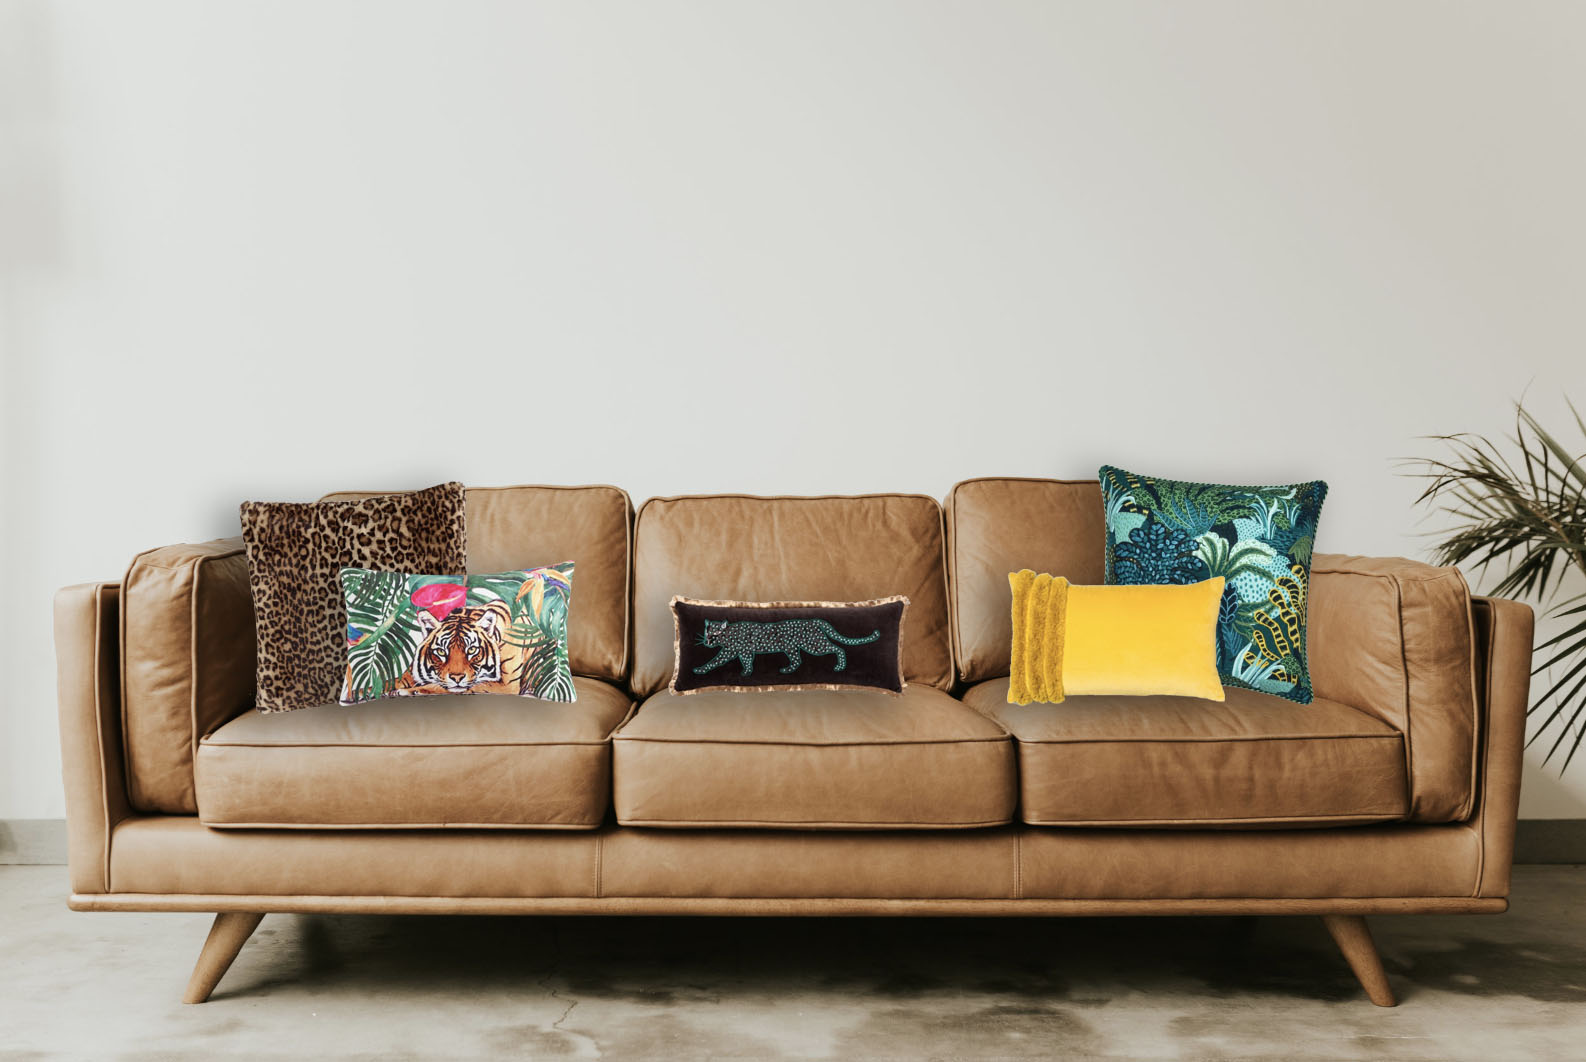 Couch_Jungle Throw Pillows.jpg